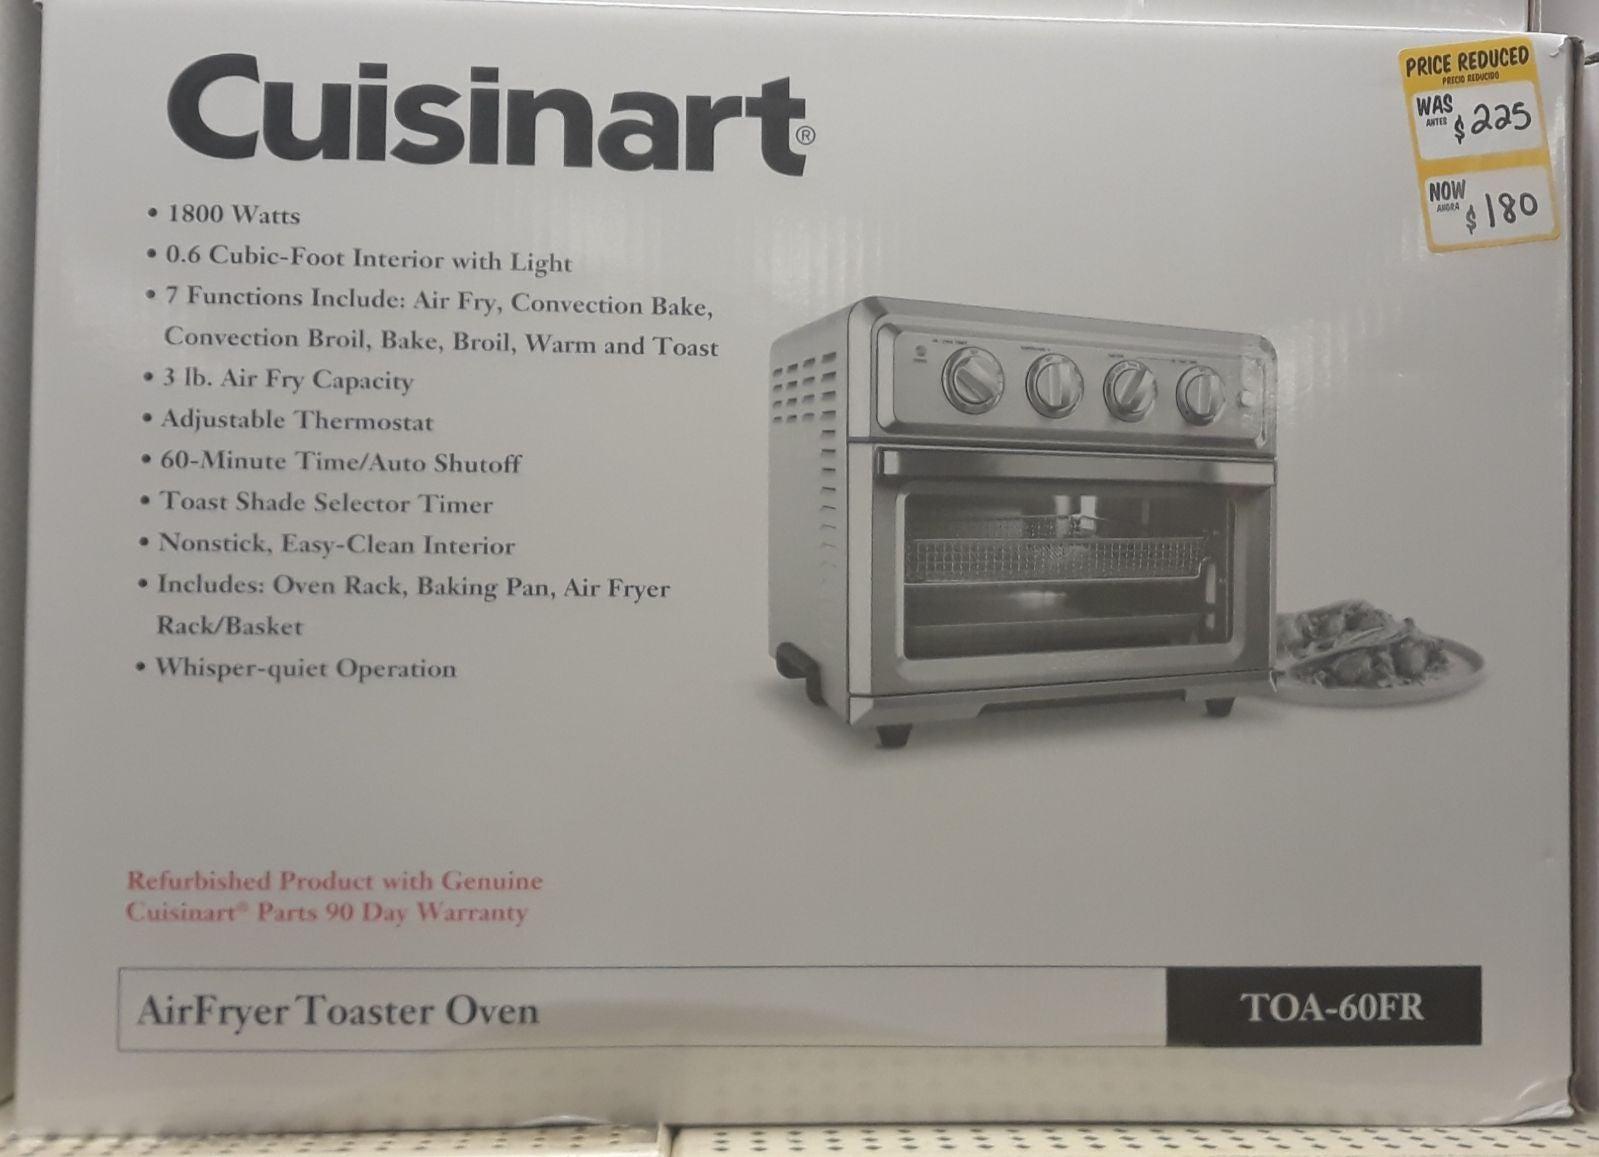 Cuisine Art Air Fryer Toaster Oven